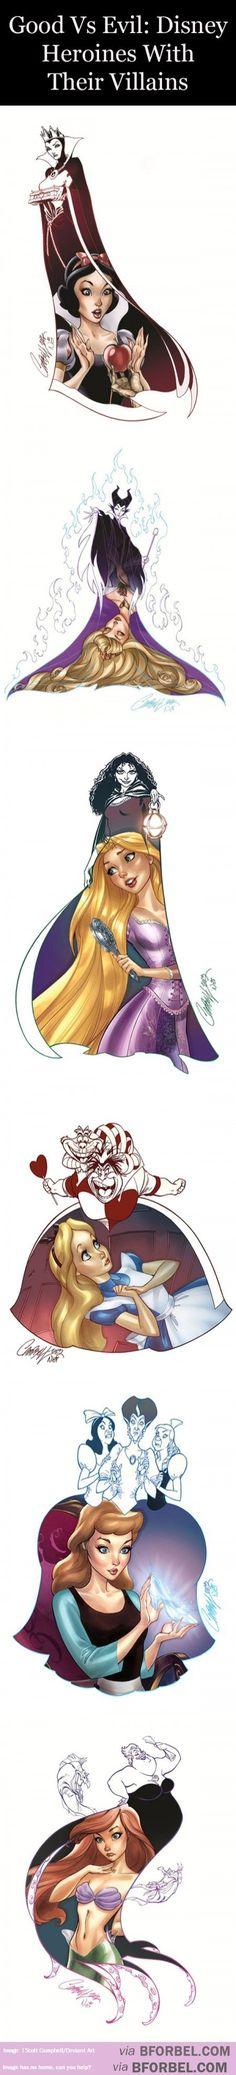 5 Disney Heroines And Their Villains…